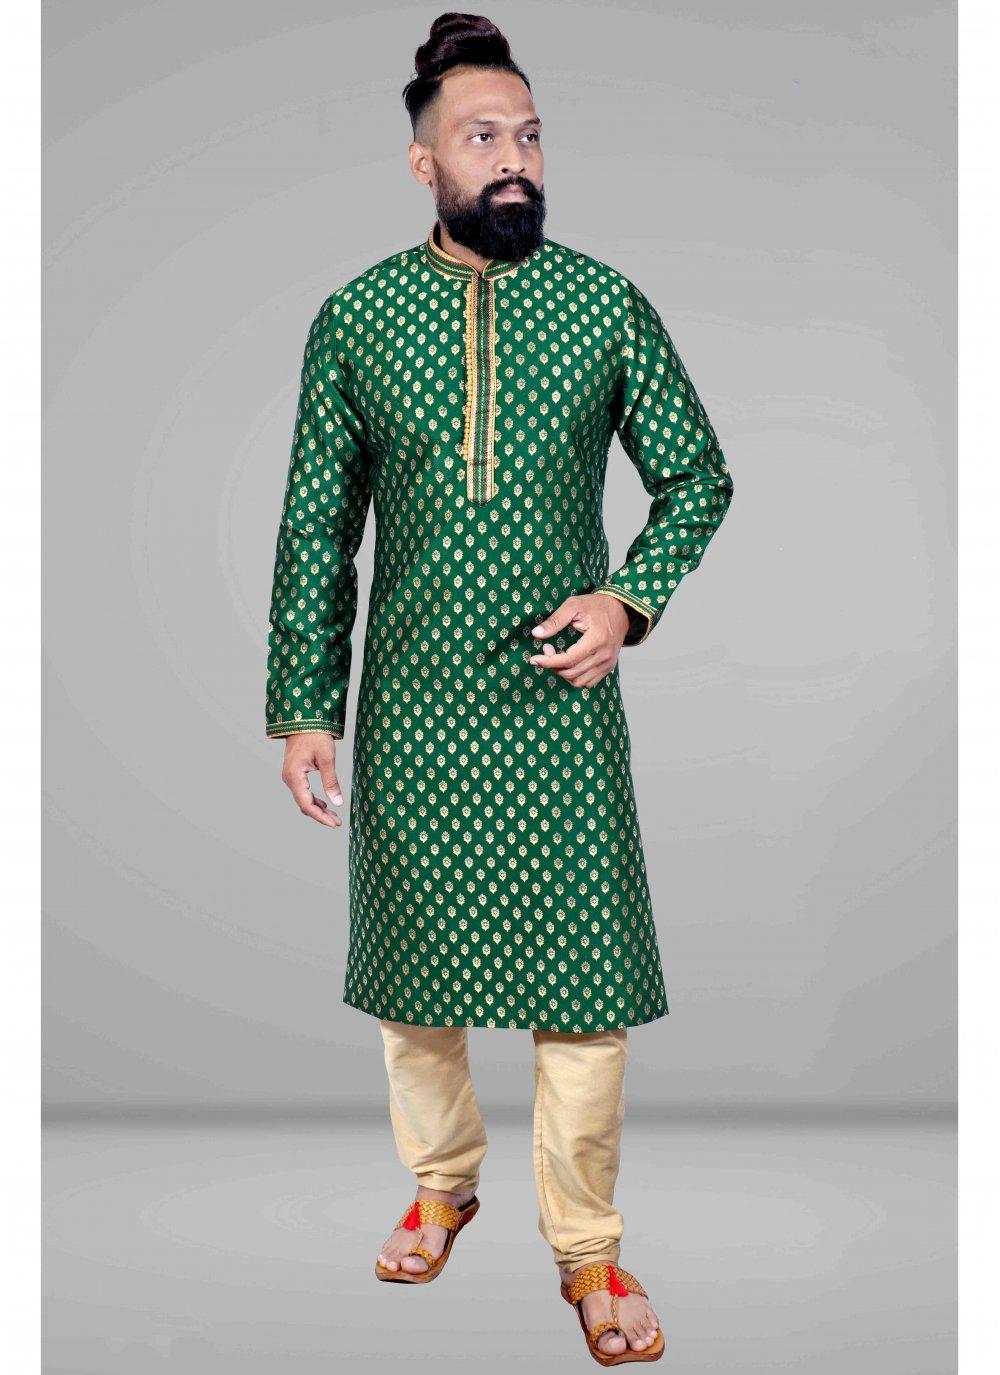 Embroidered Jacquard Kurta Pyjama in Green